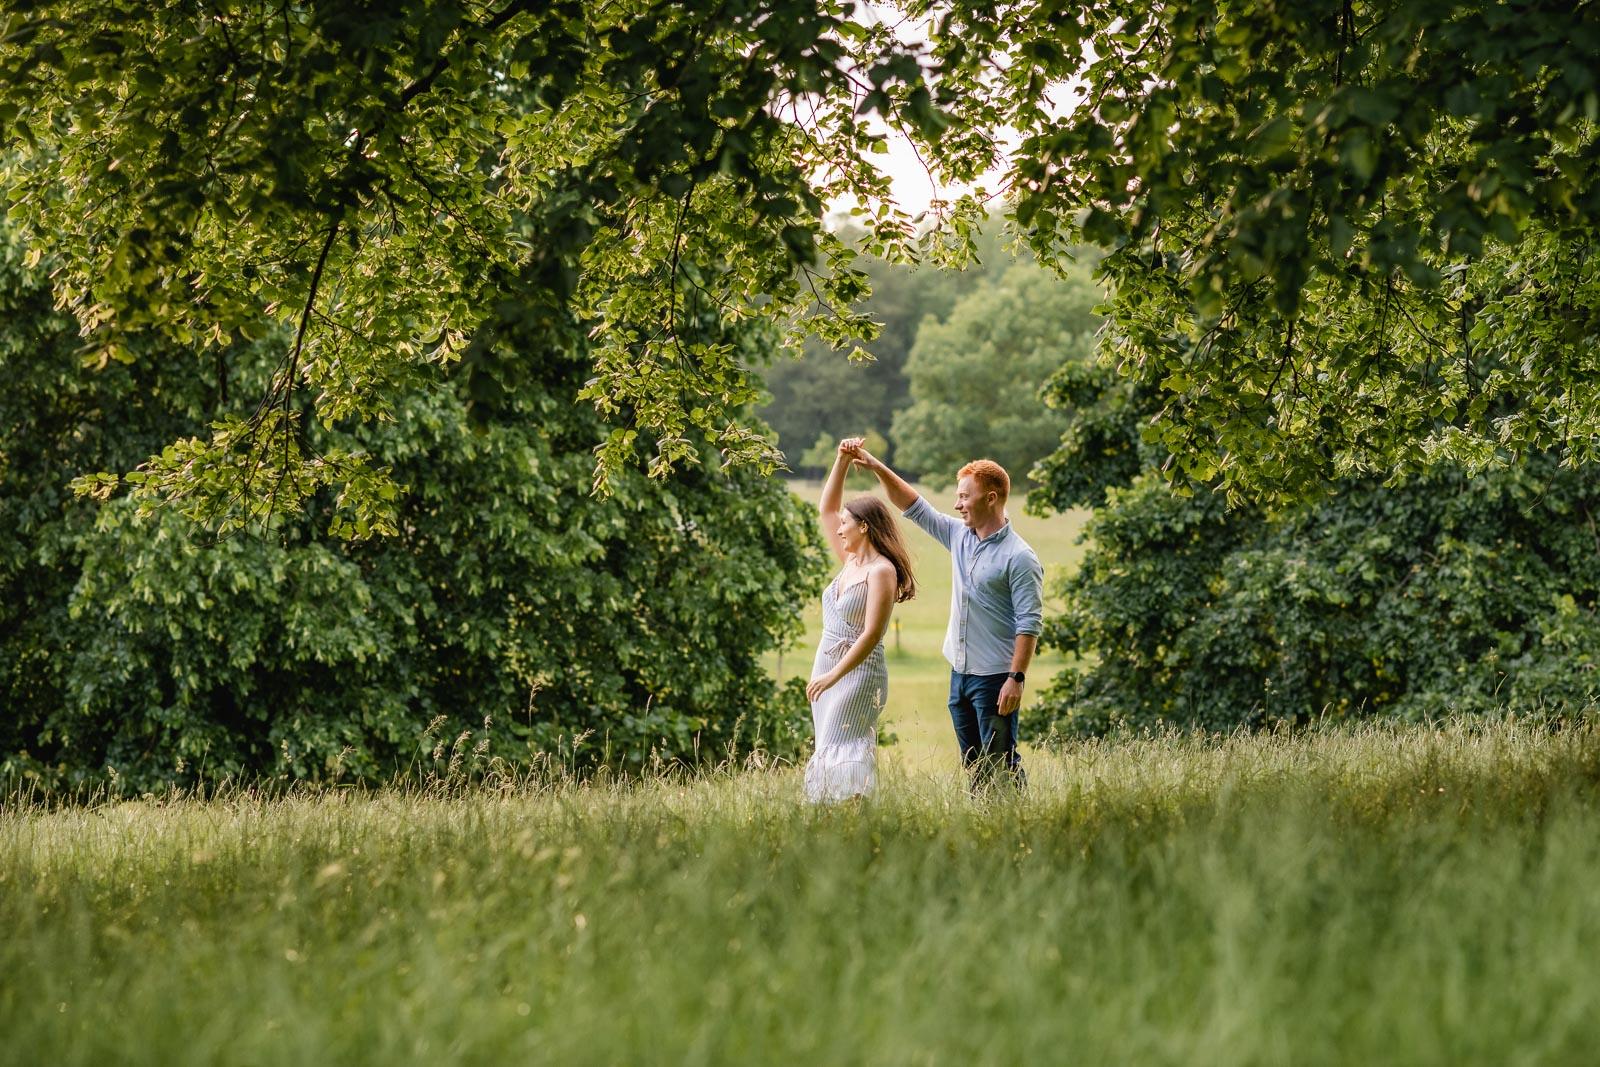 Burghley House pre-wedding shoot – Victoria & David